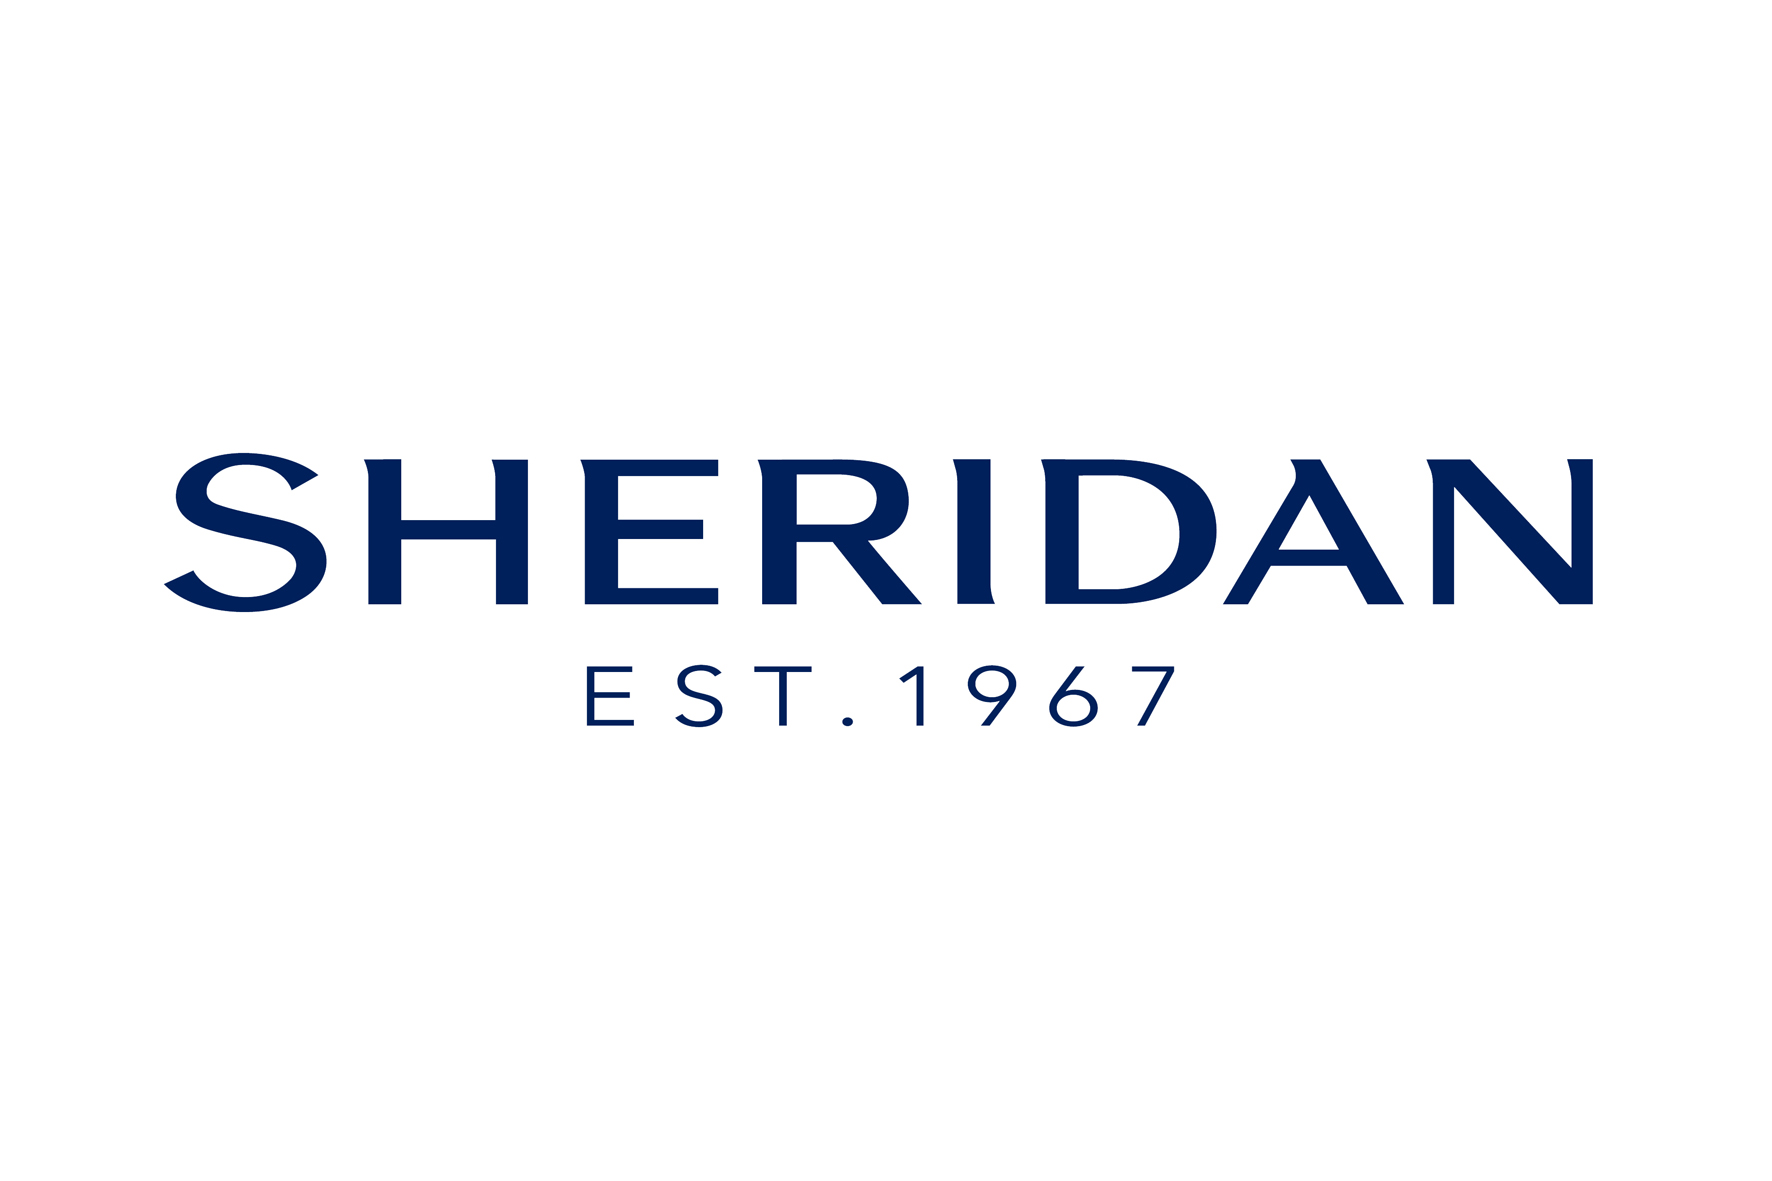 Sheridan Blue_WhiteBgrd